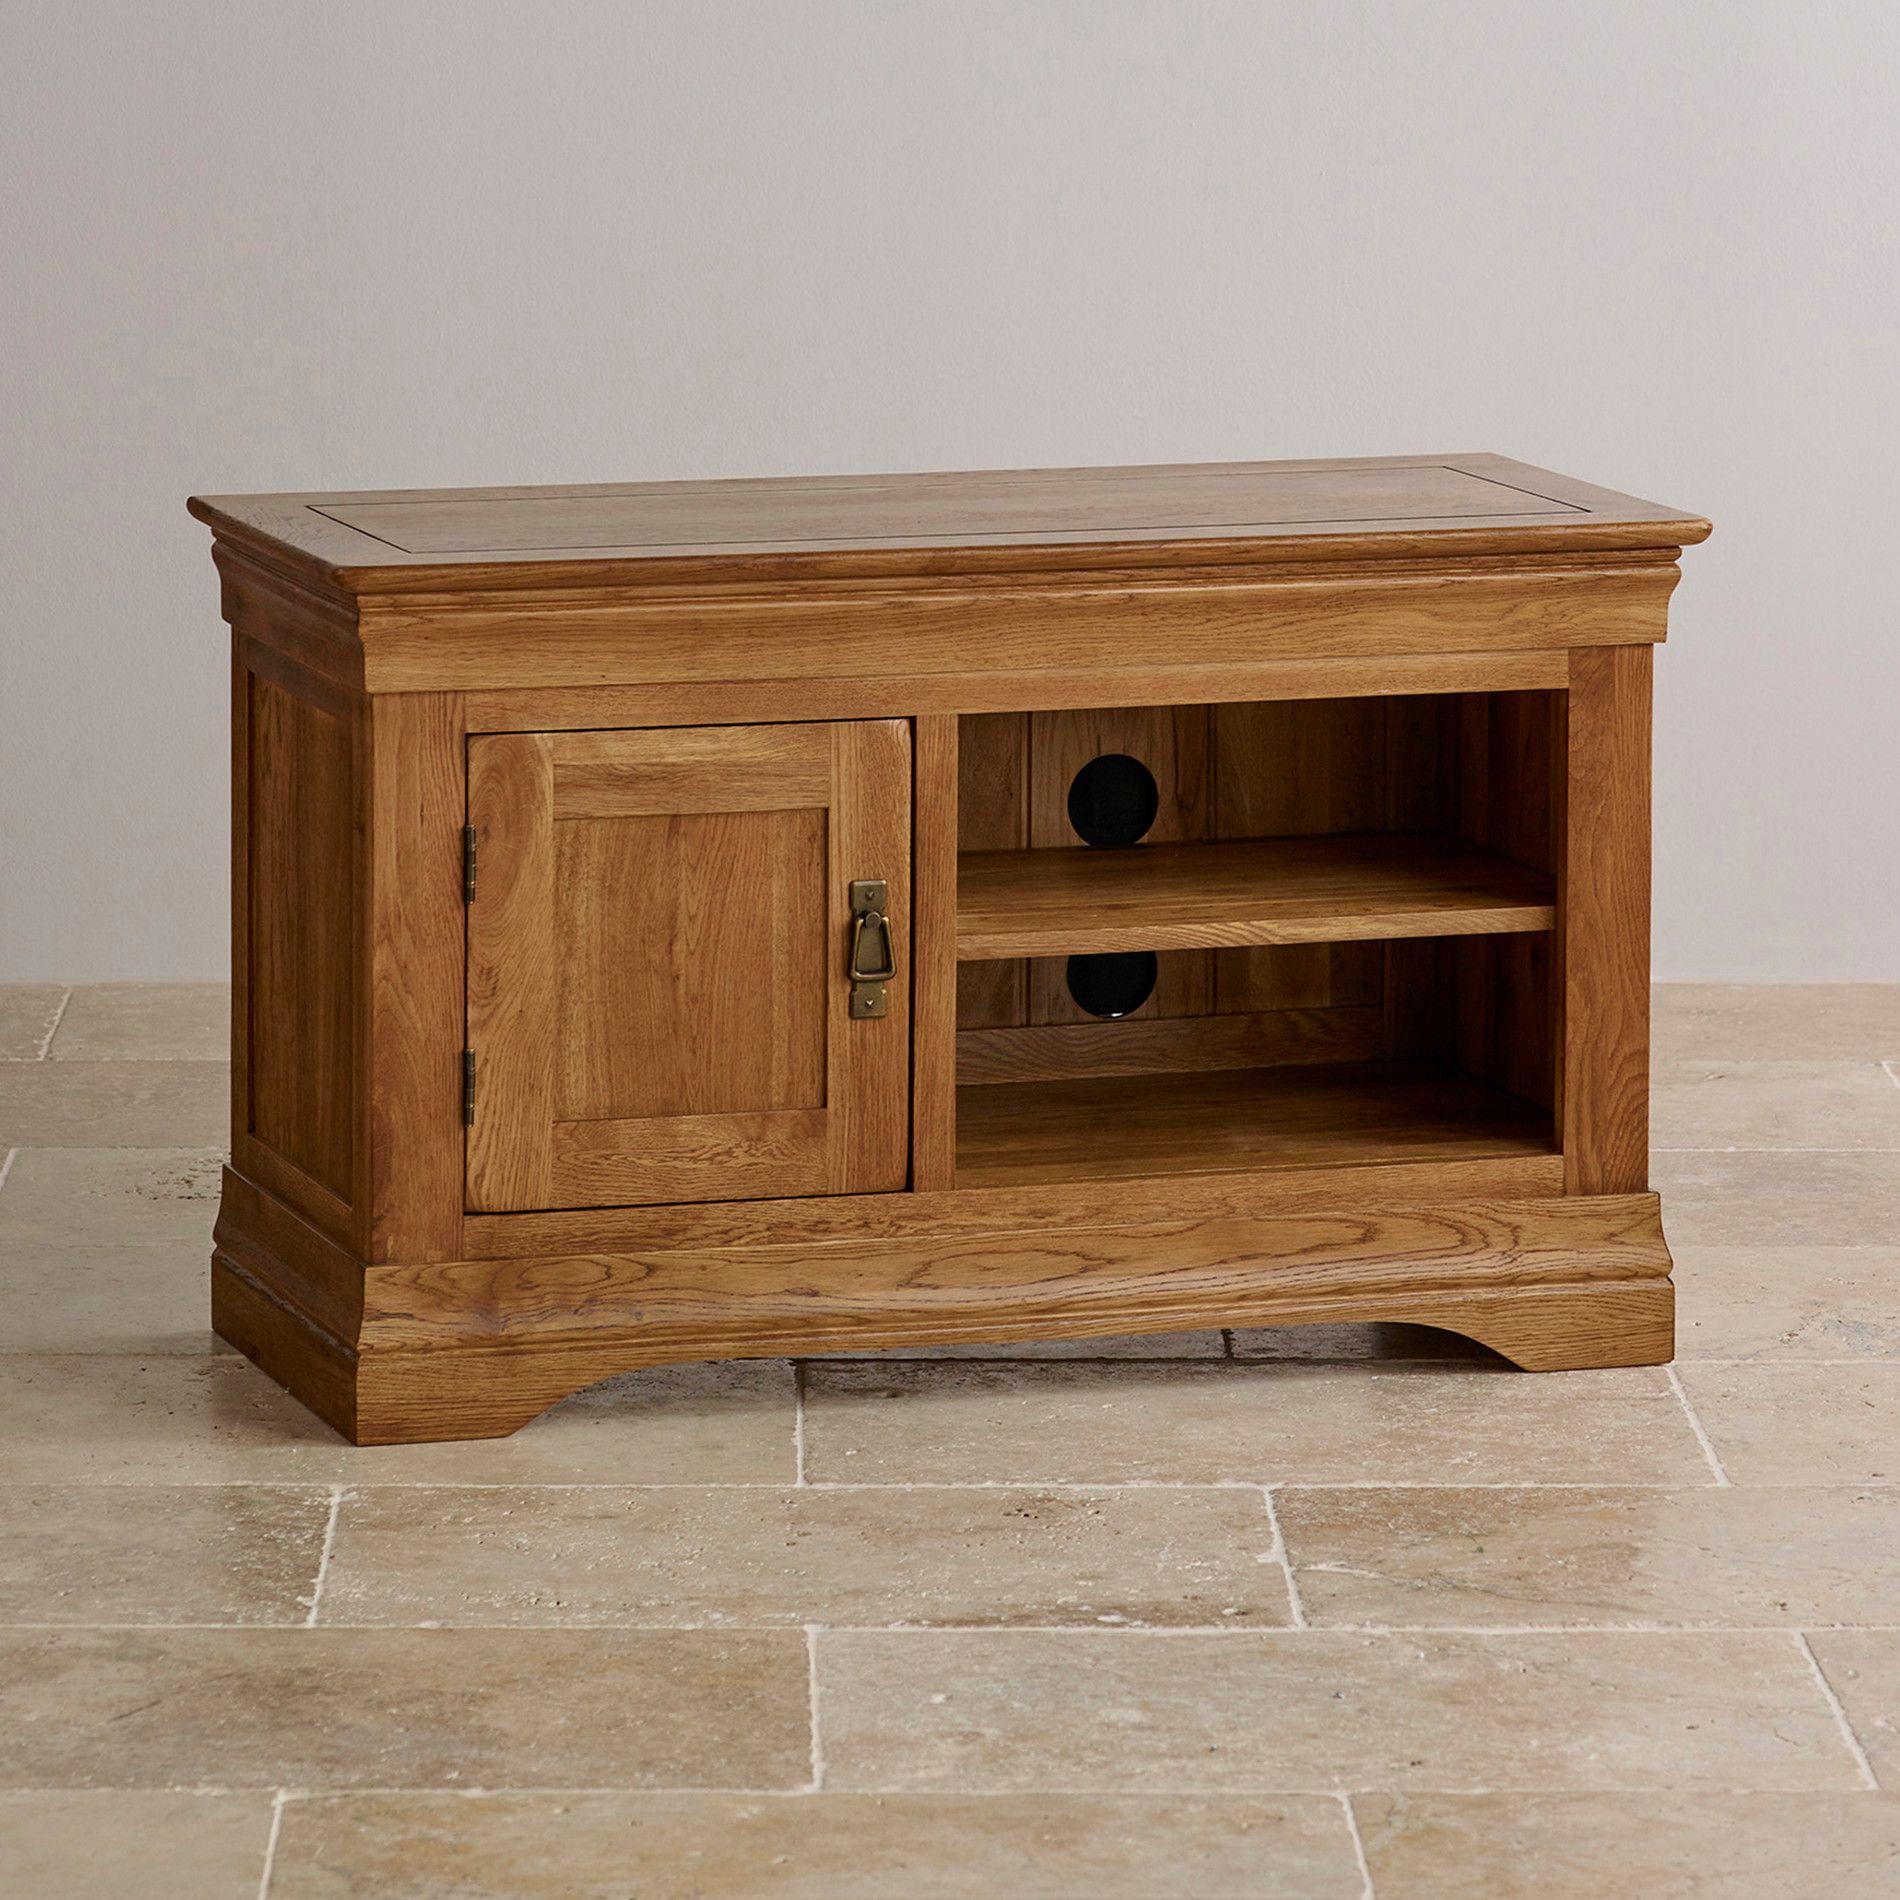 small tv units furniture. French Farmhouse Rustic Solid Oak Small TV Cabinet Tv Units Furniture